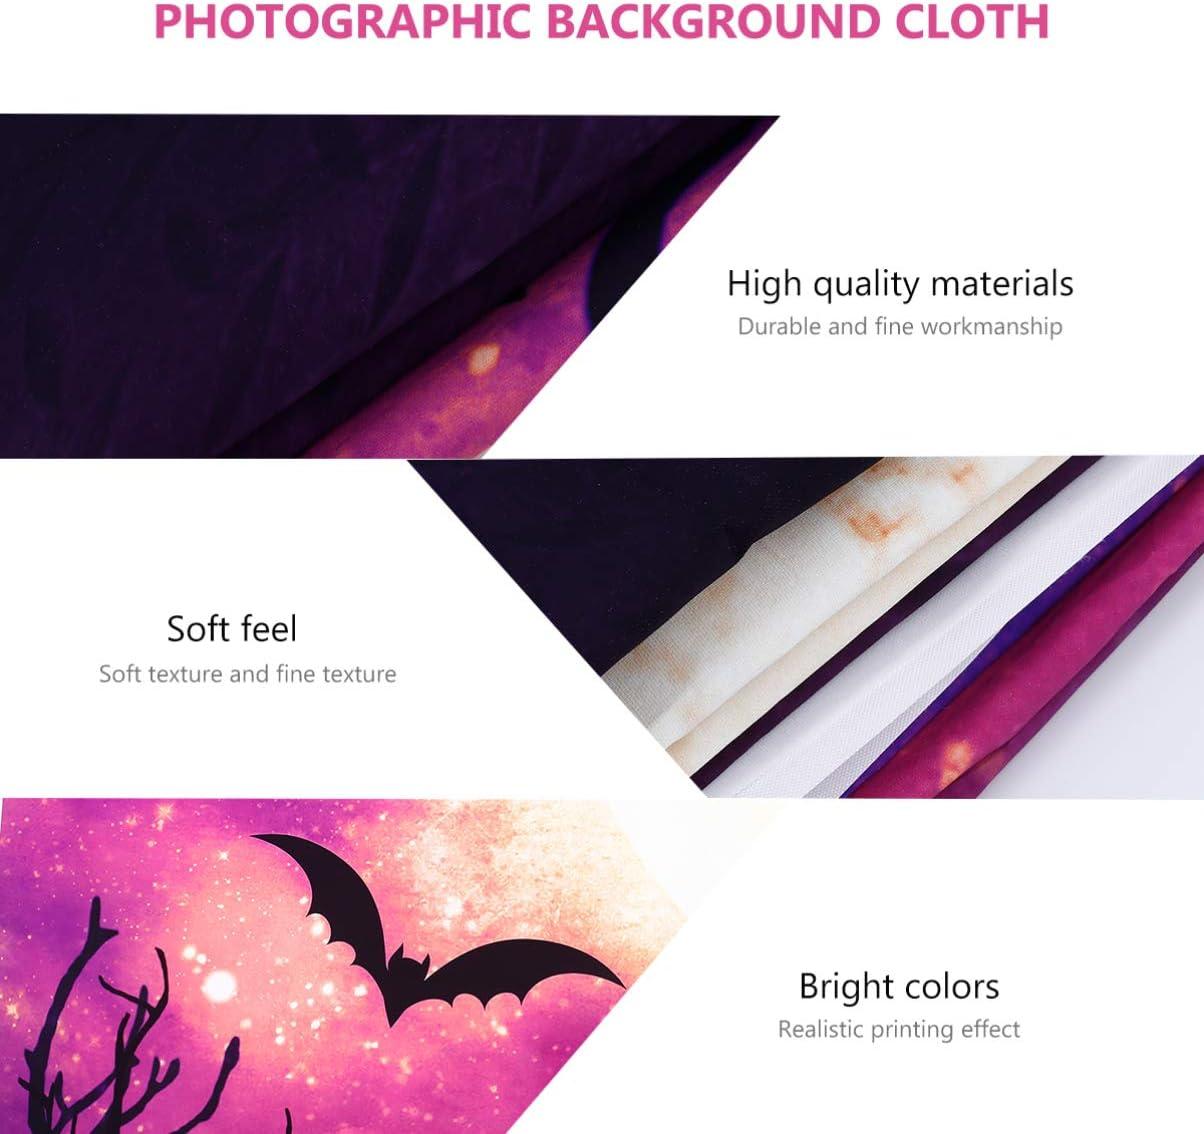 OSALADI Halloween Photo Backdrop Vinyl Creepy Bat Castle Photography Background Cloth Photo Booth Shoot Studio Props Halloween Party Decor